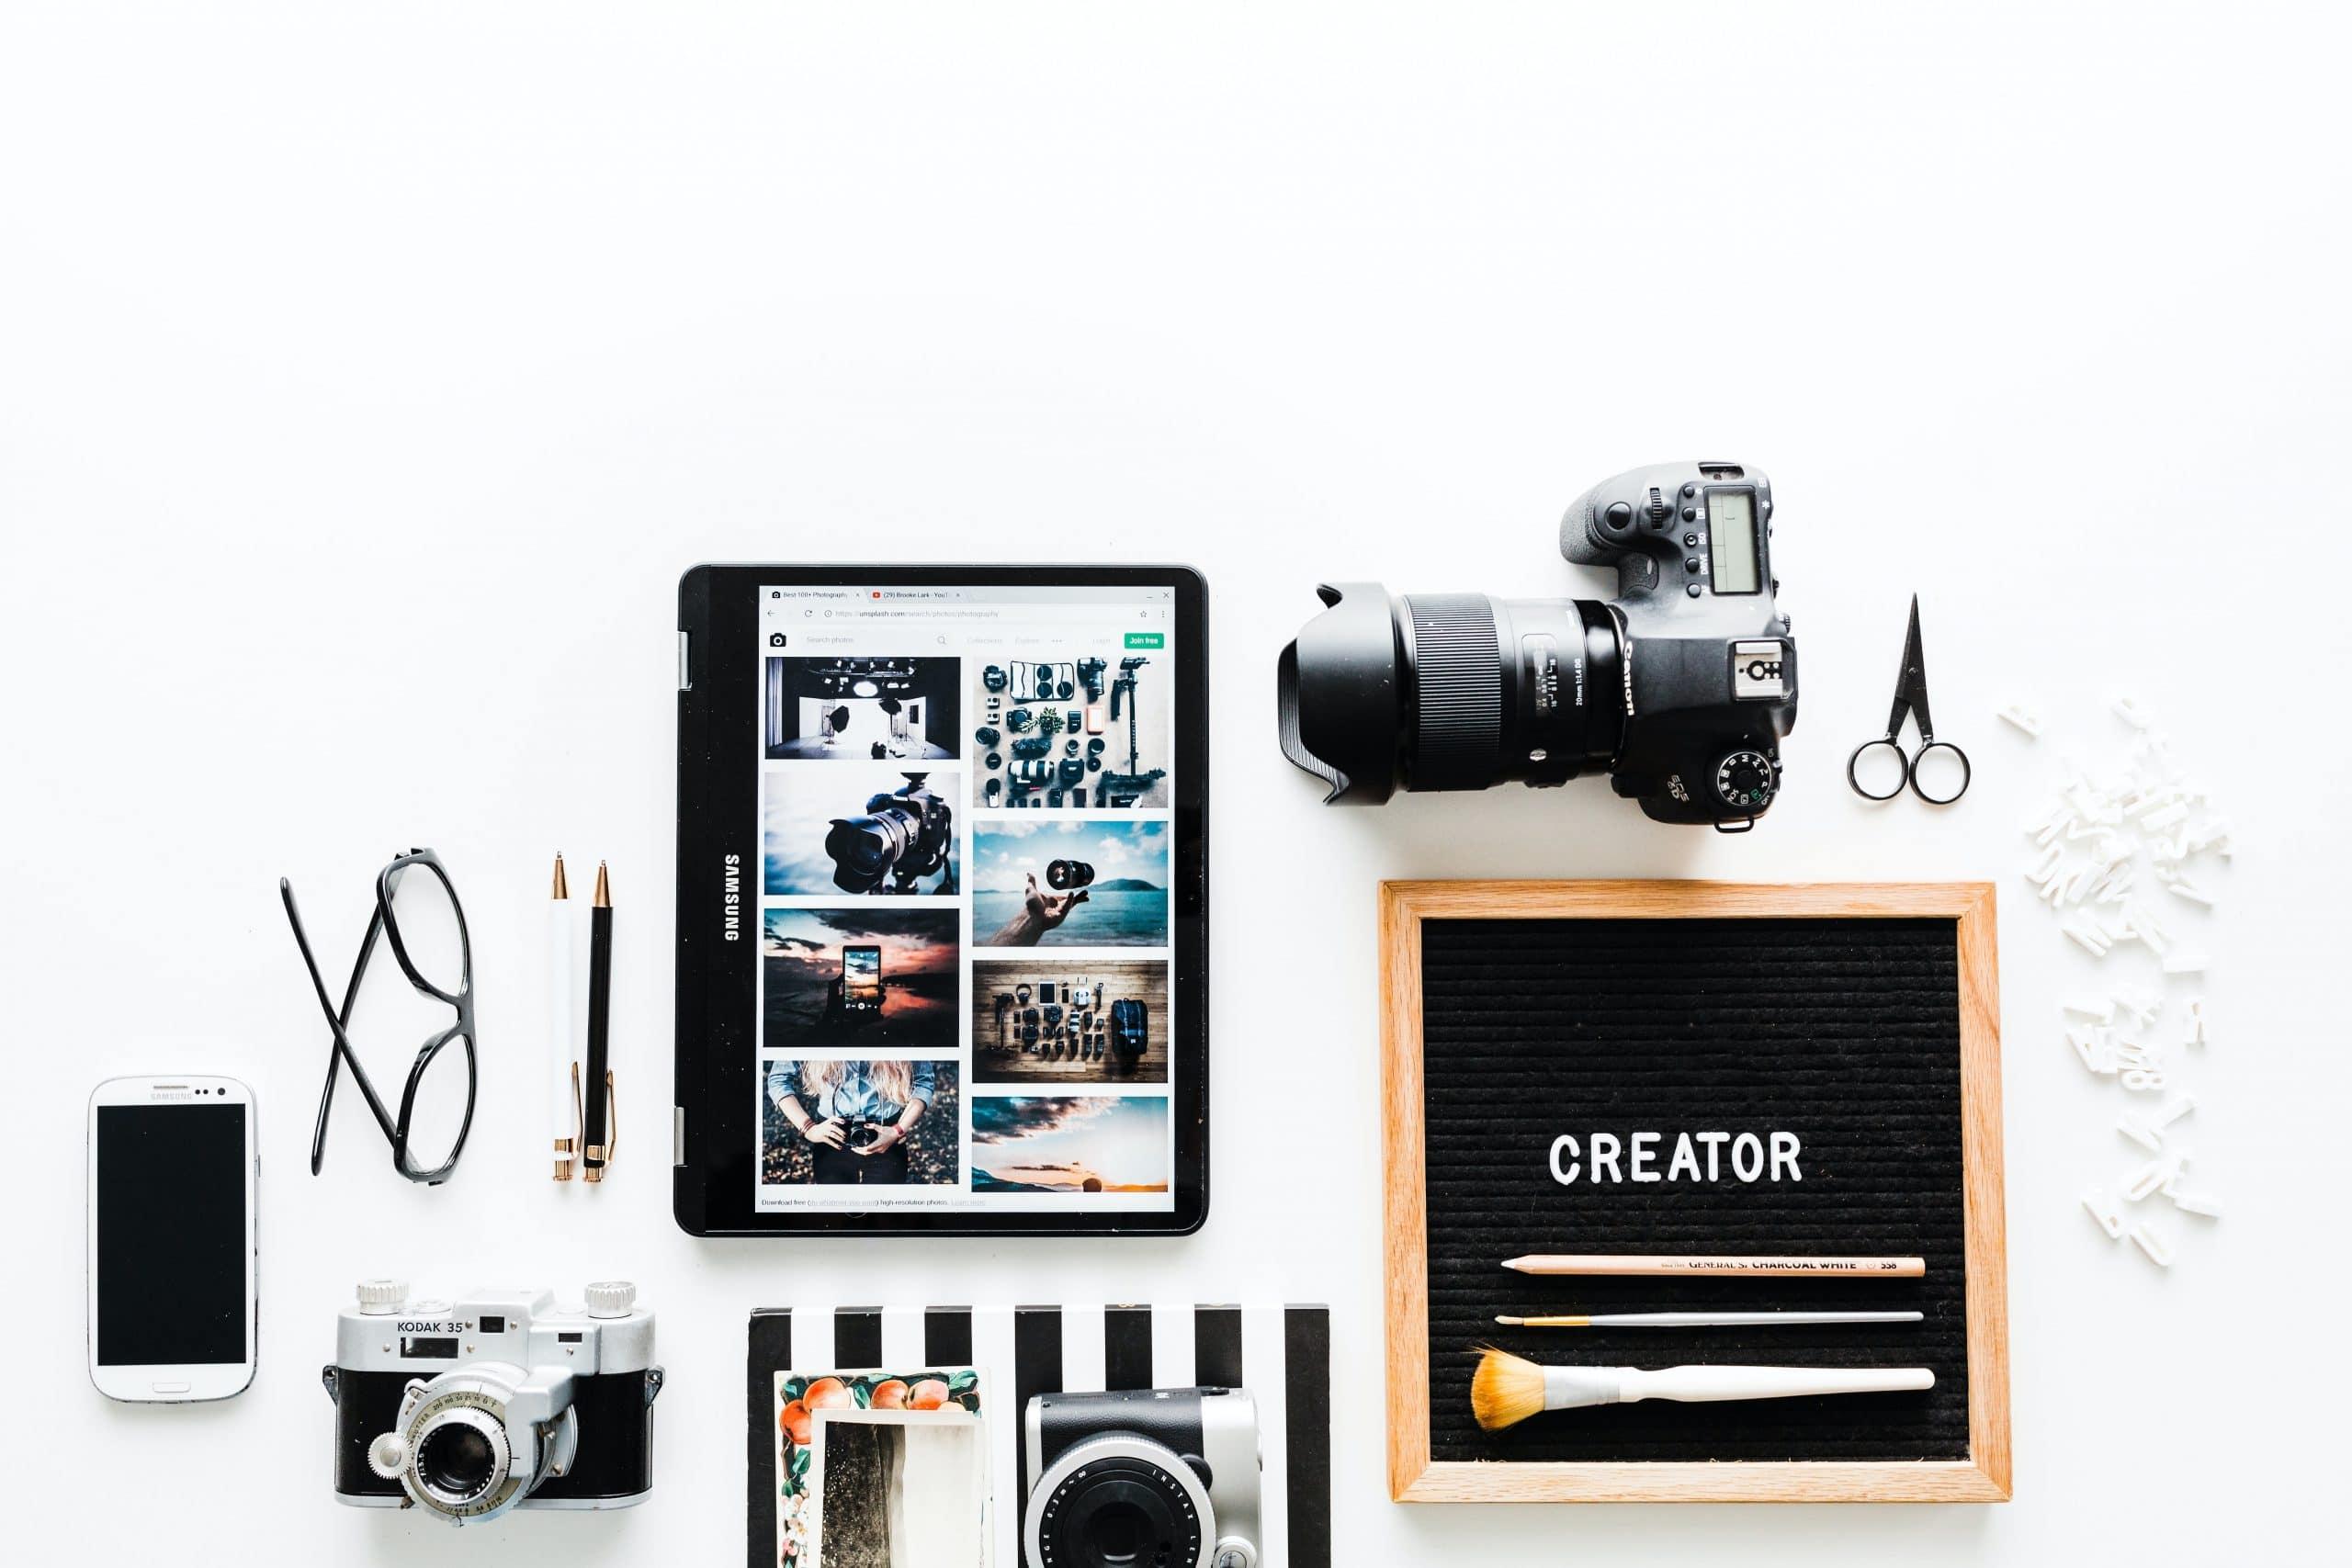 Flat view of camera, notebook, etc.